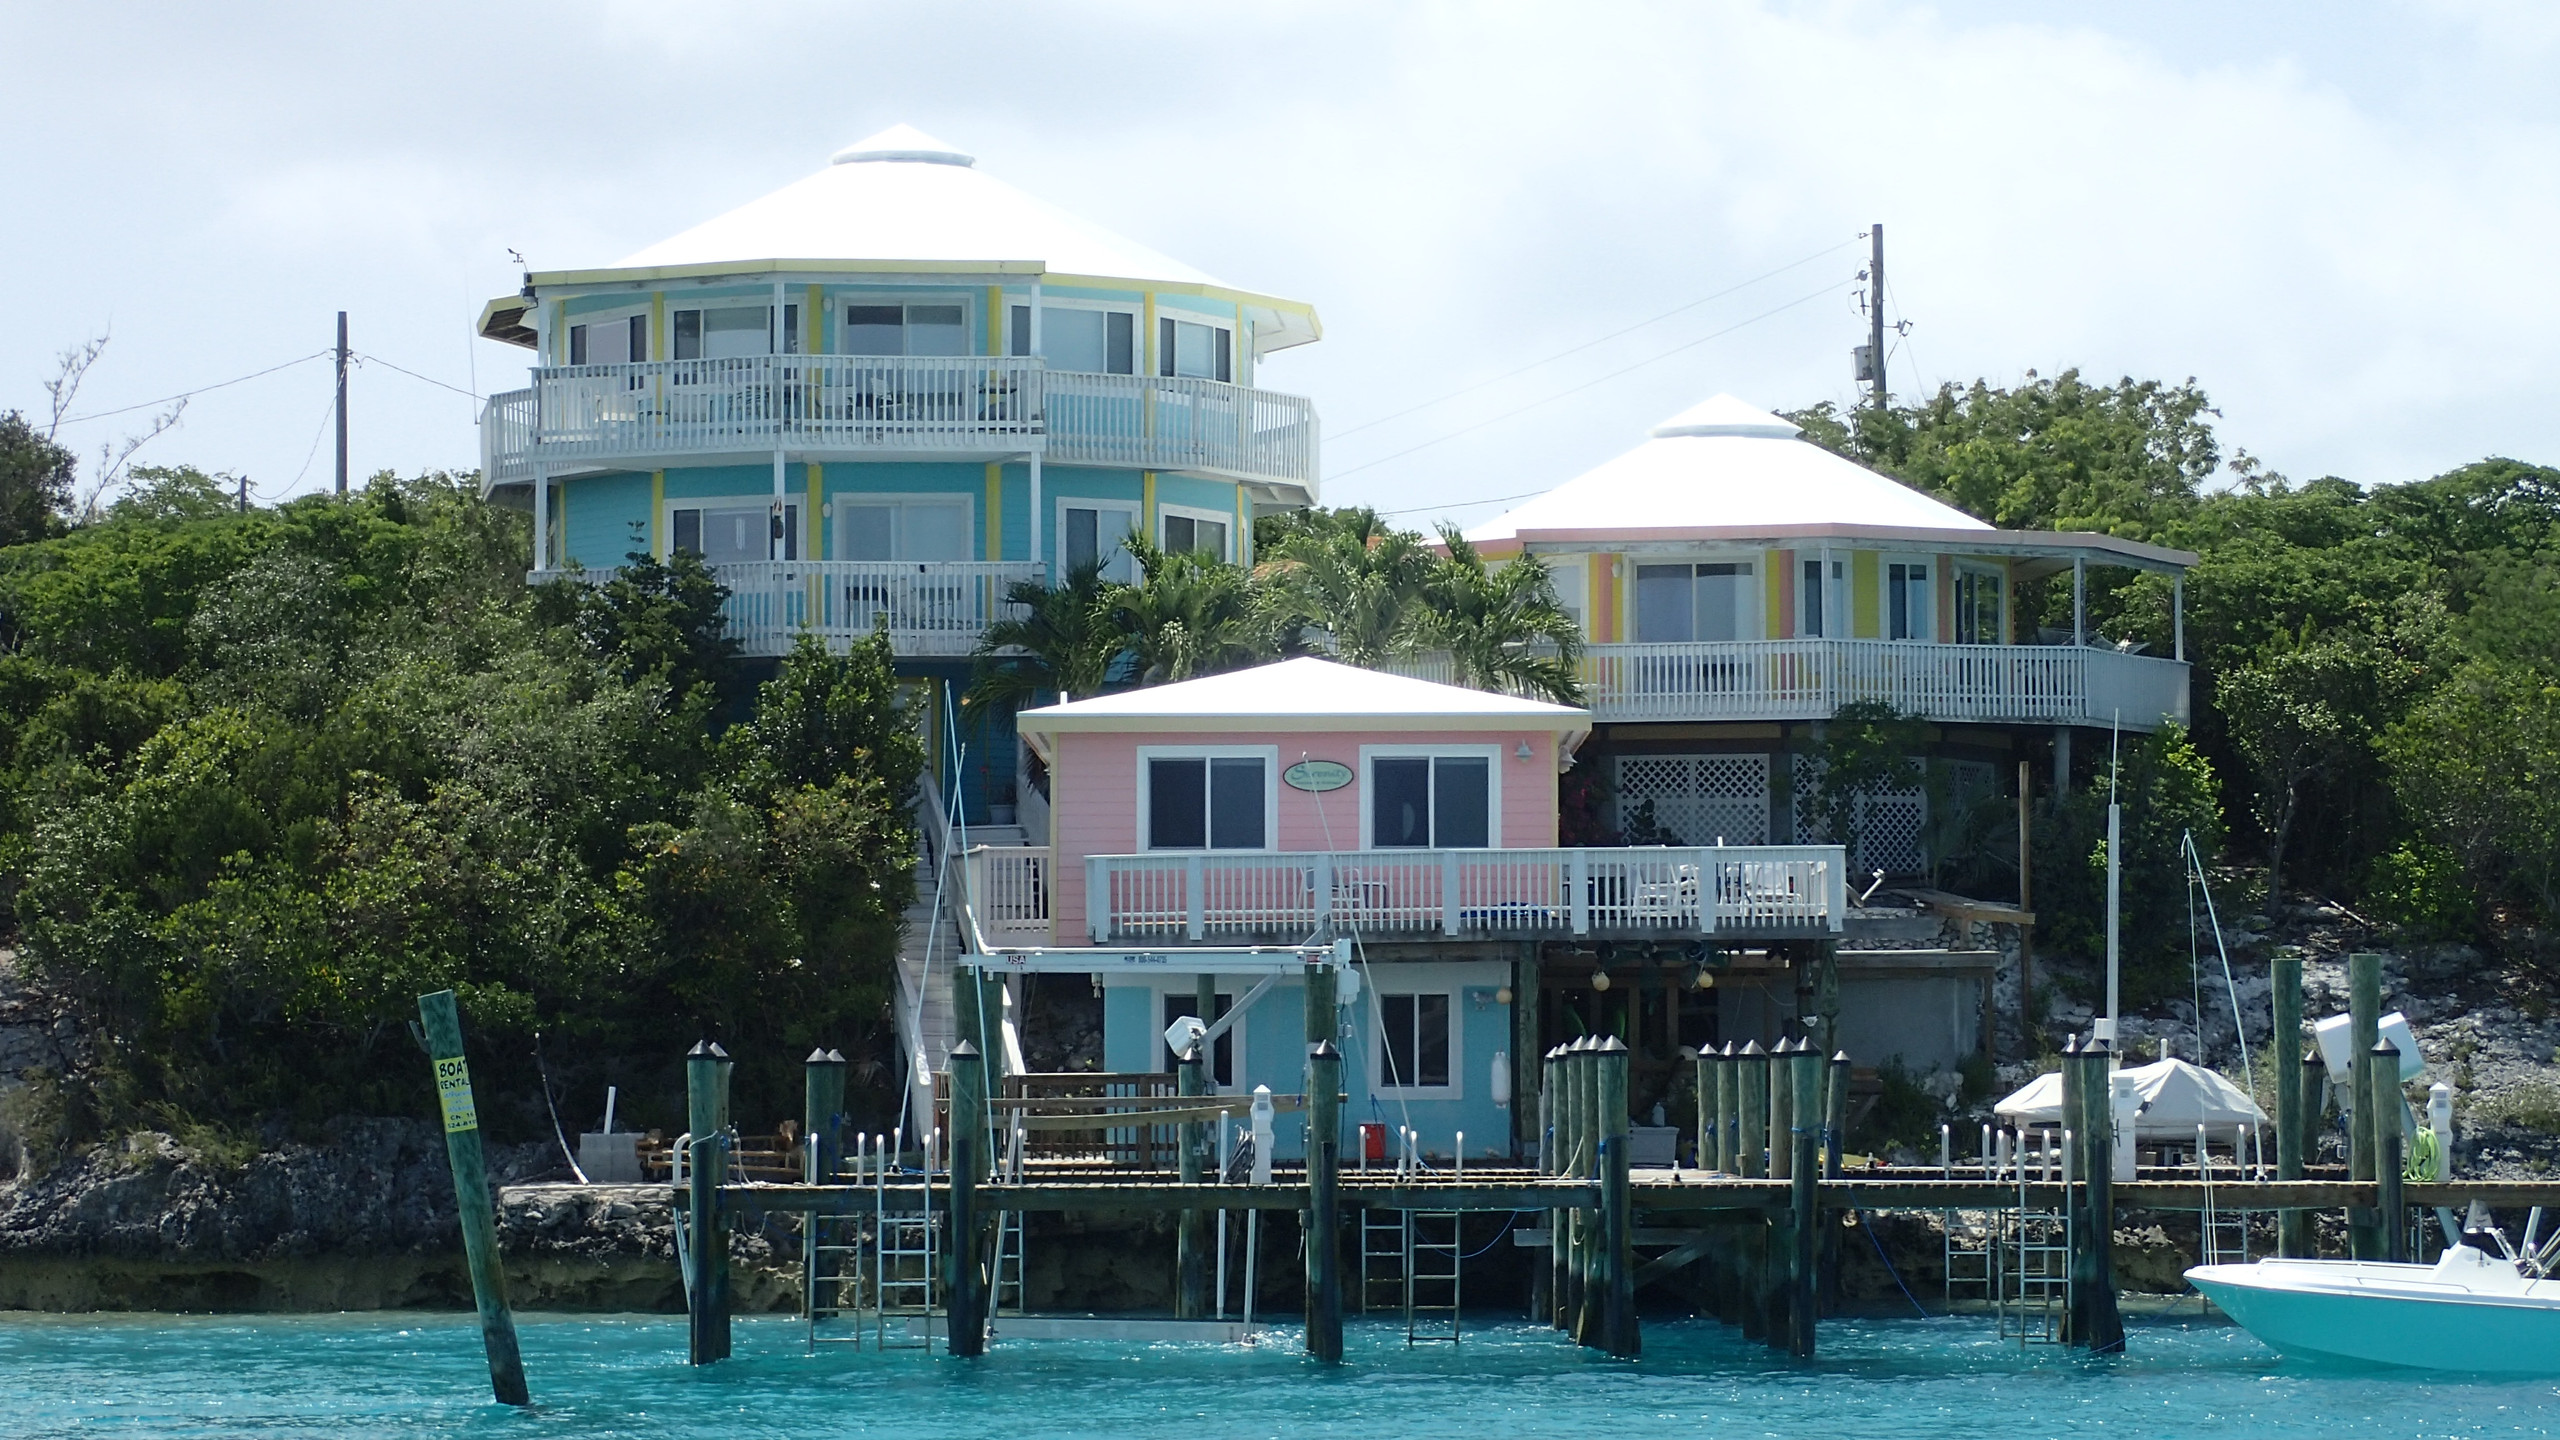 Bahamian Houses